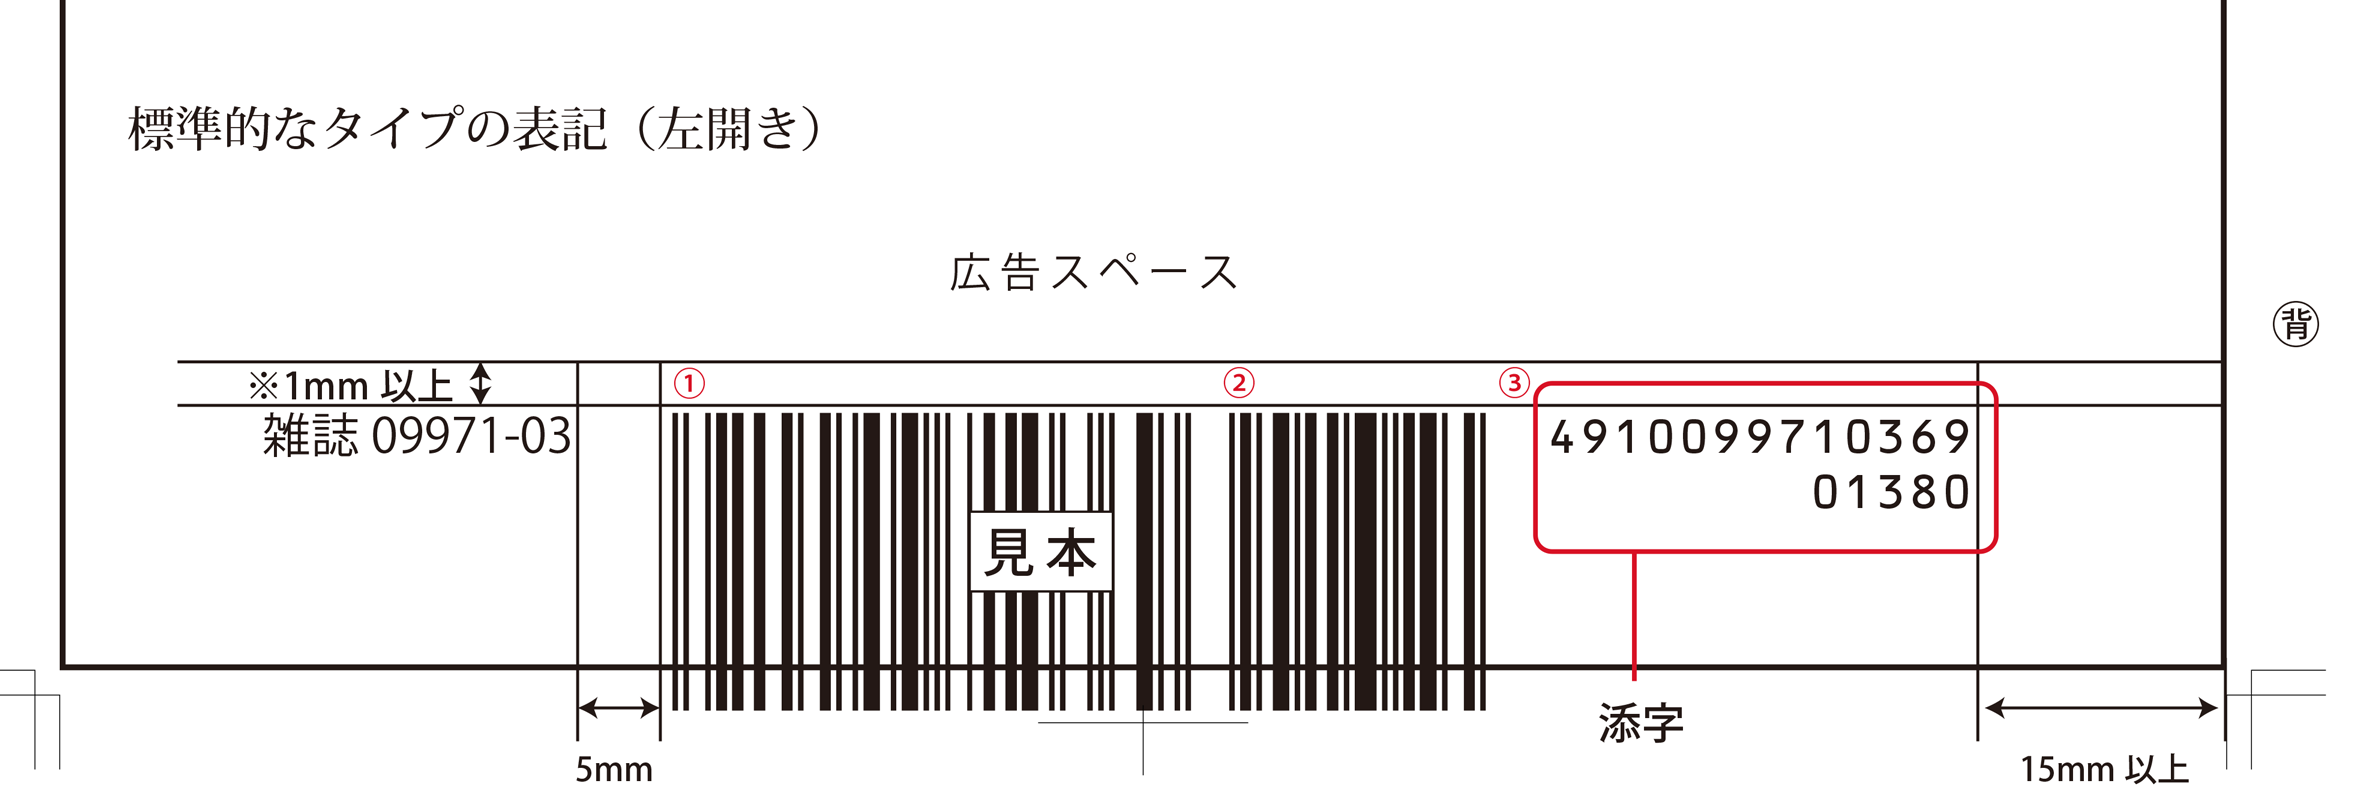 column_115-1